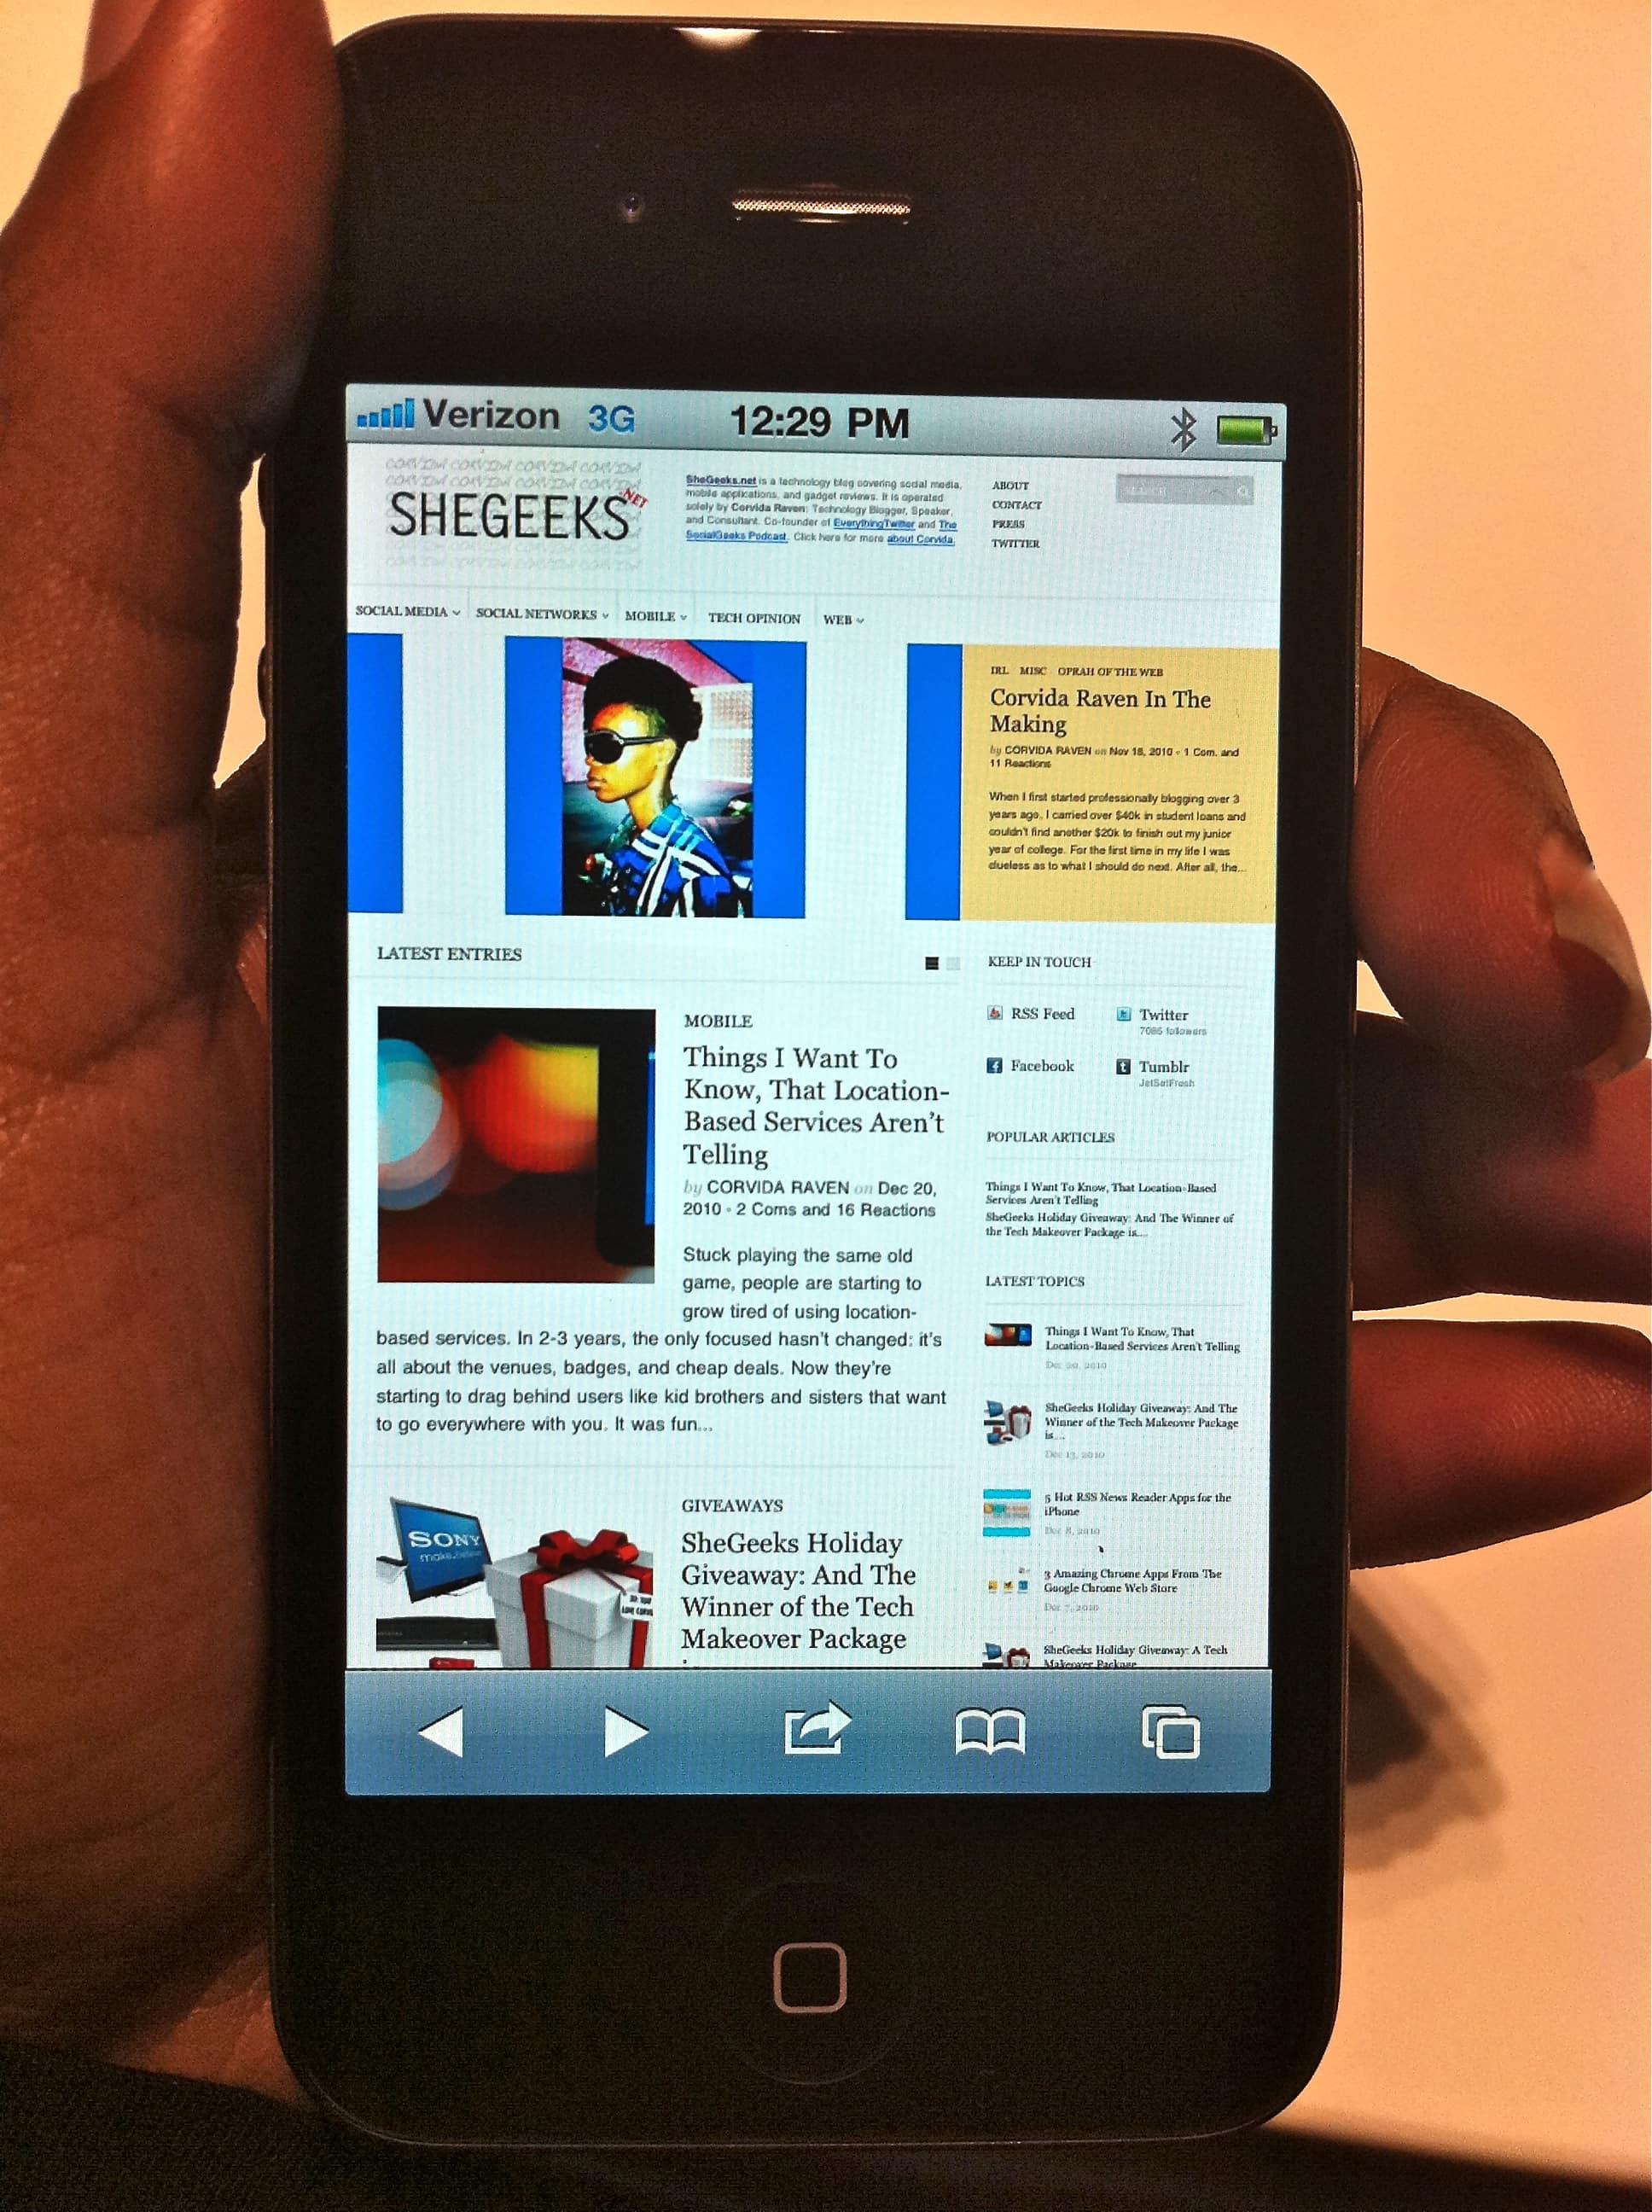 SheGeeks on iPhone 4 (Verizon)